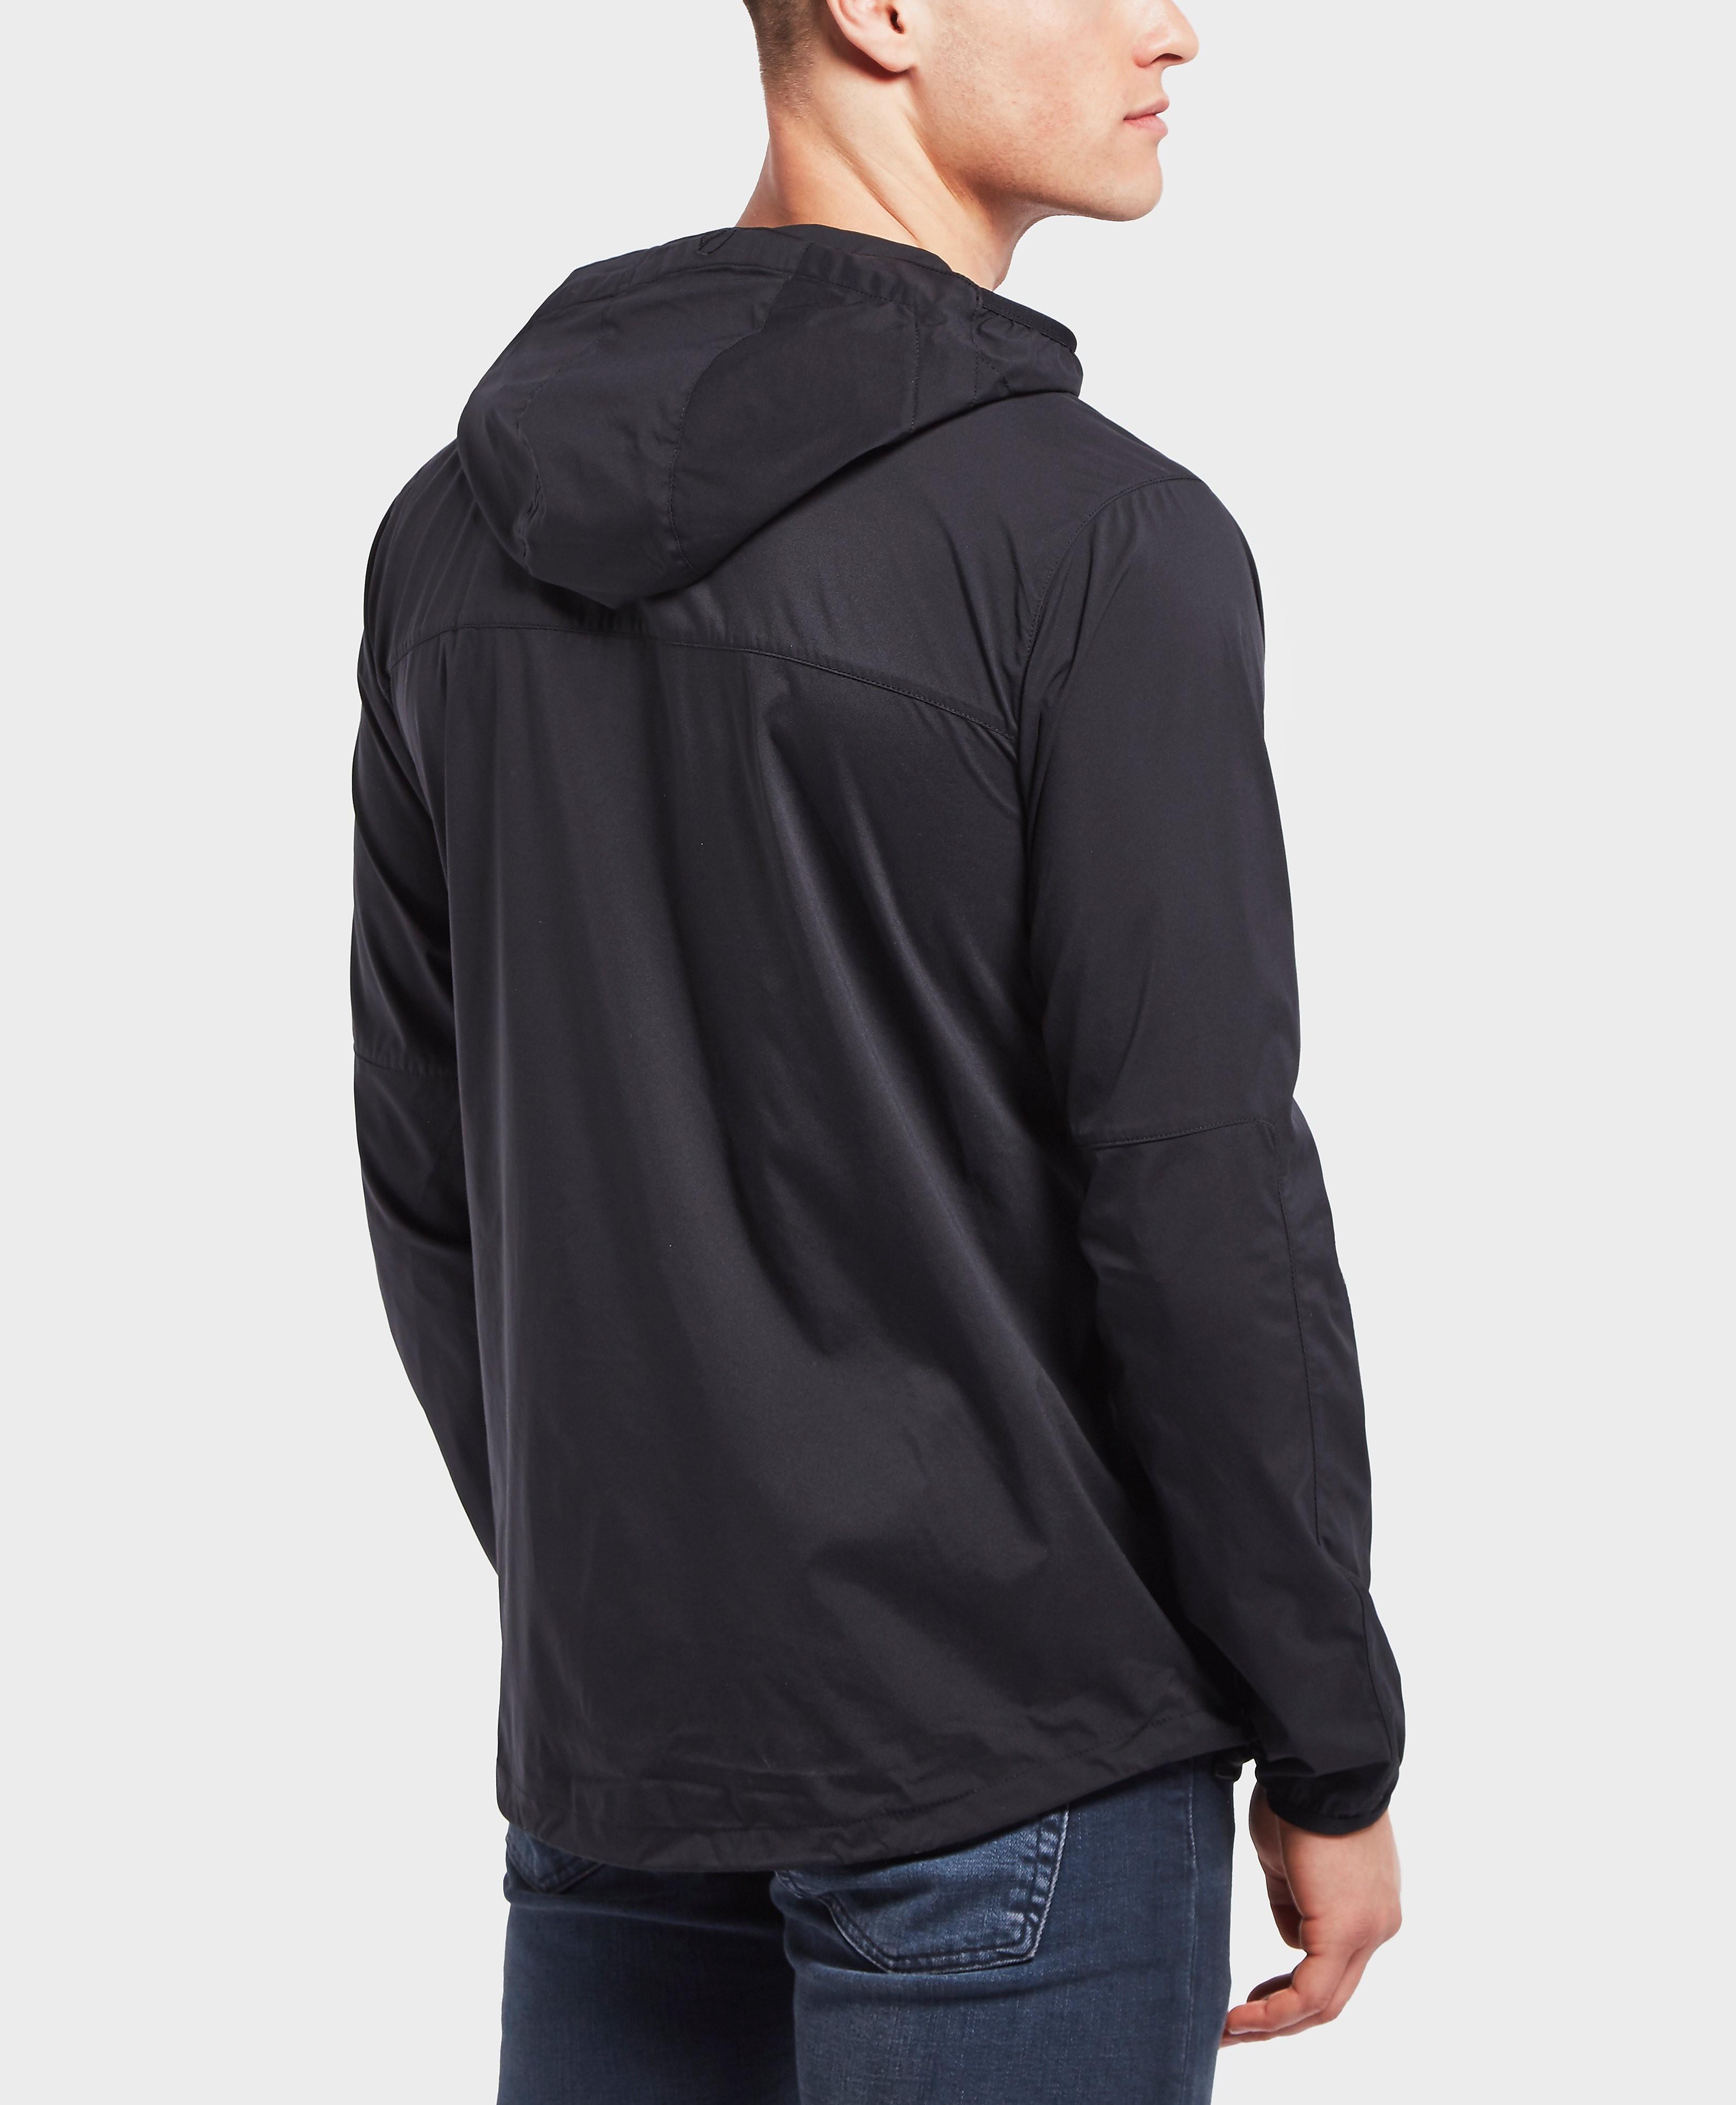 Fjallraven Abisko Lightweight Windbreaker Jacket